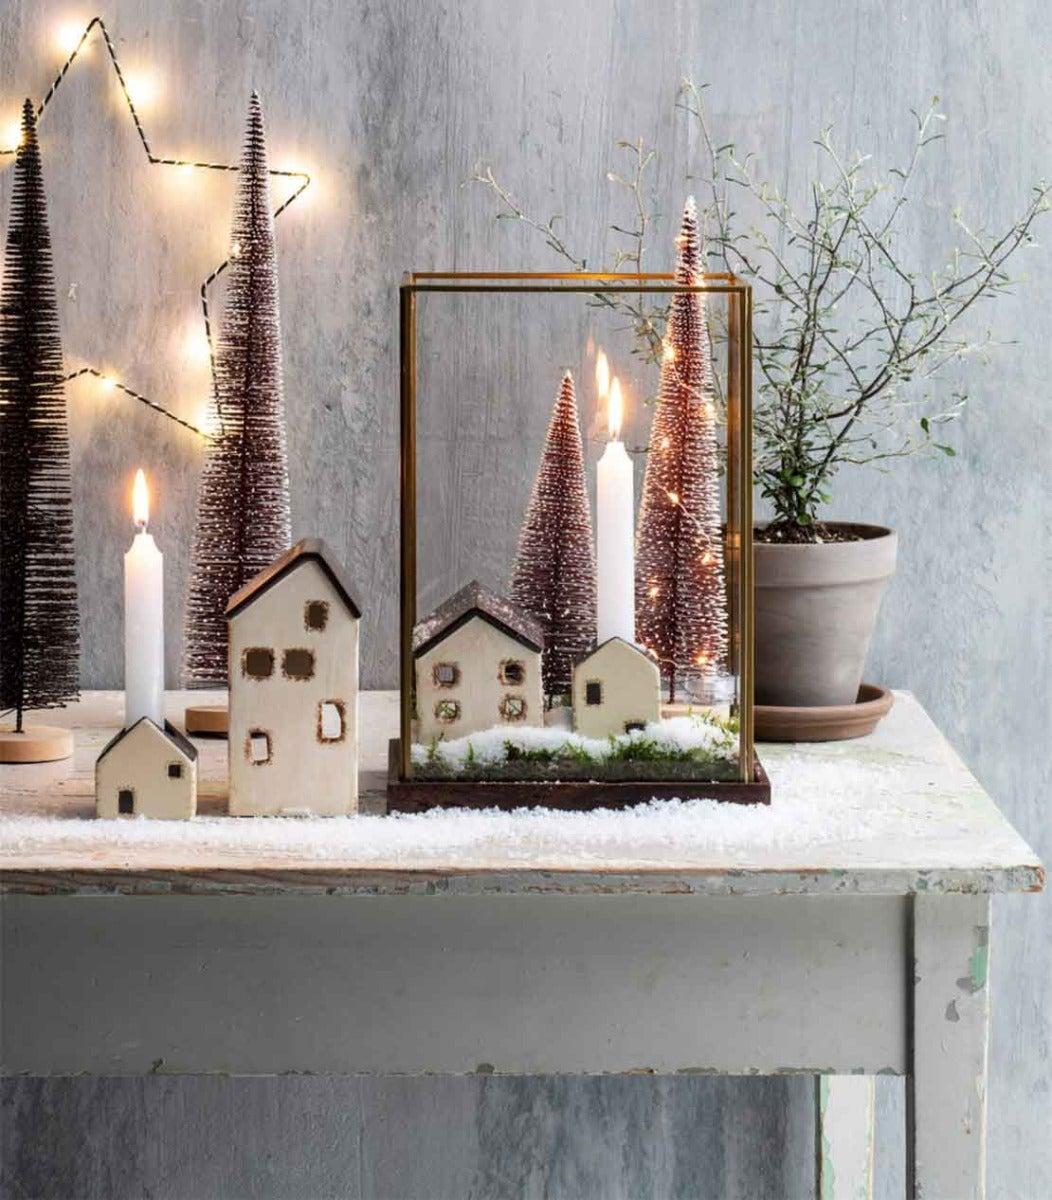 Mini kerstdorp in windlicht